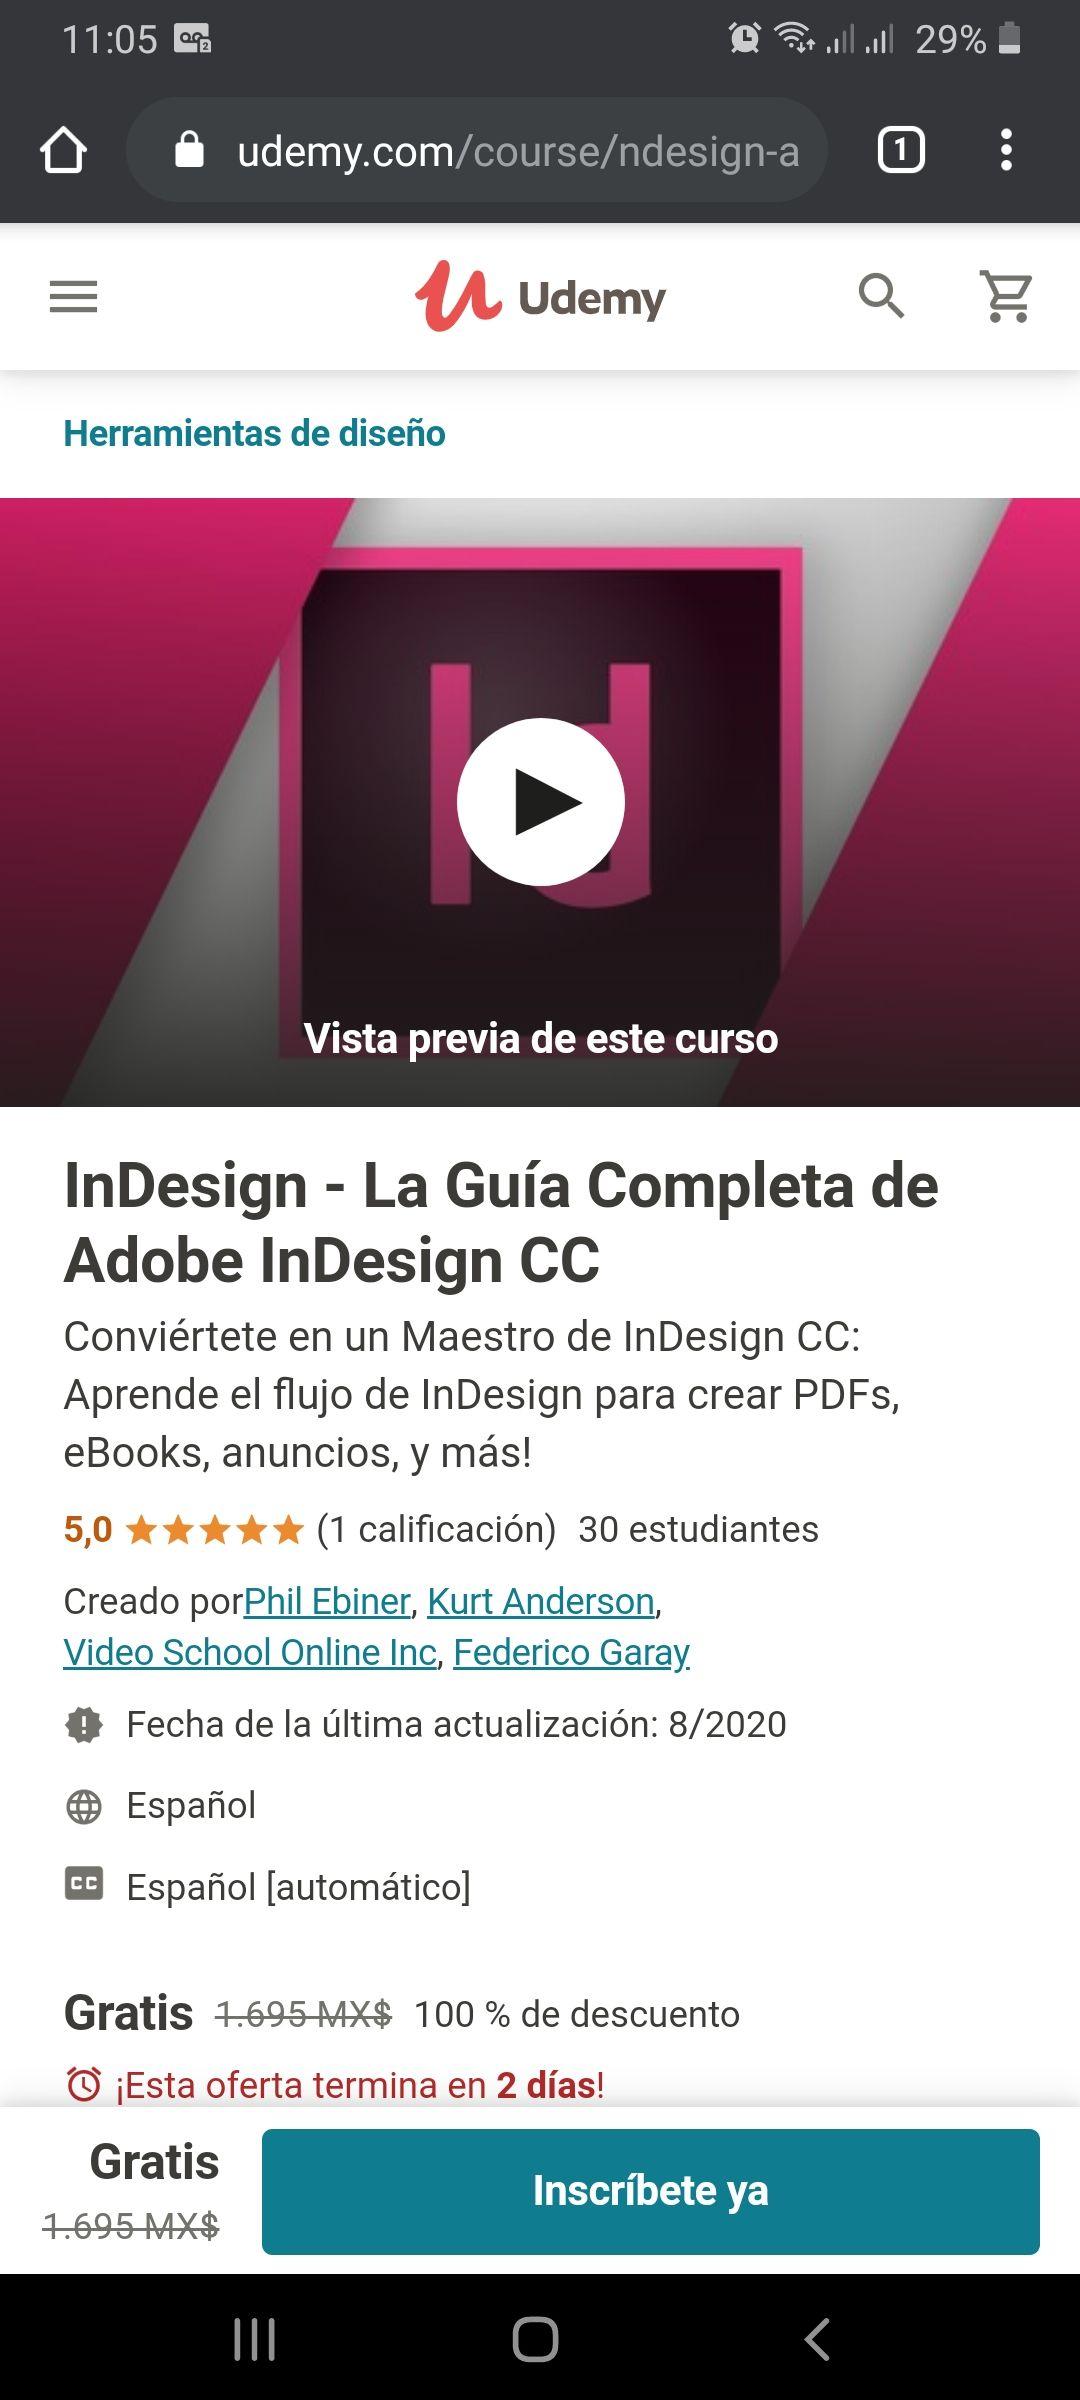 Udemy: InDesign - La Guía Completa de Adobe InDesign CC